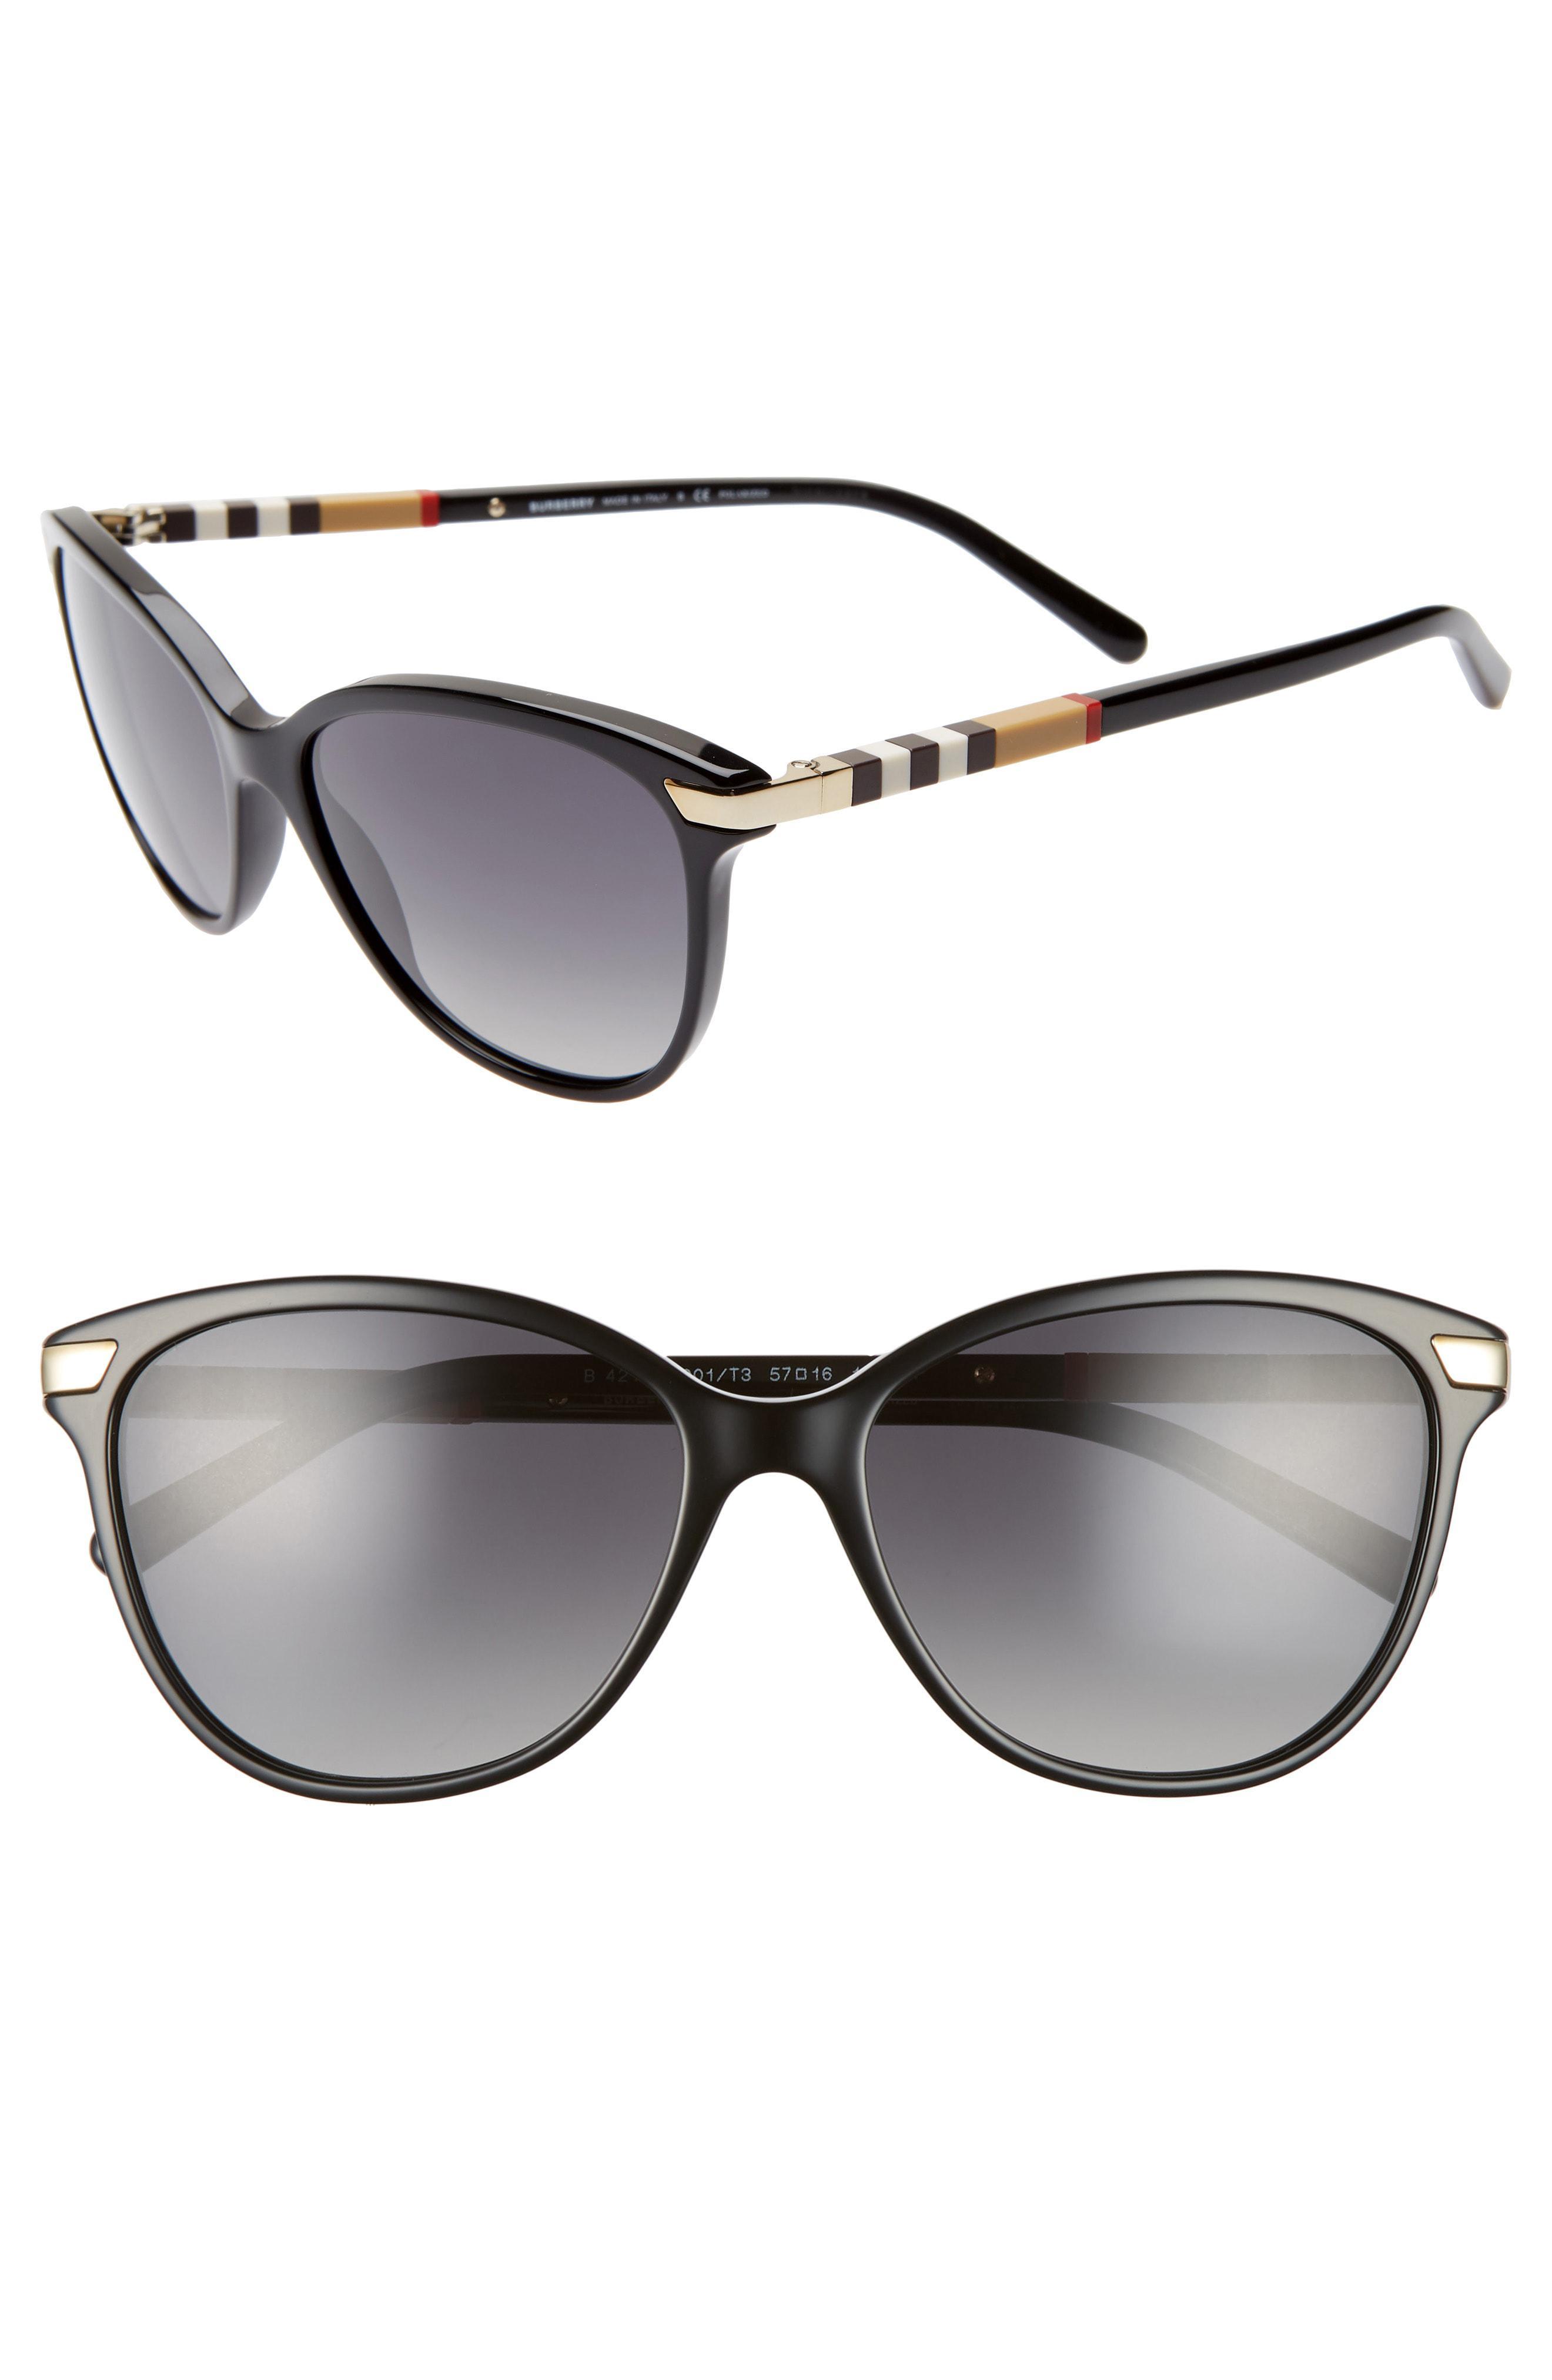 2597c8bf997 Burberry. Women s Black Check 57mm Polarized Gradient Cat Eye Sunglasses